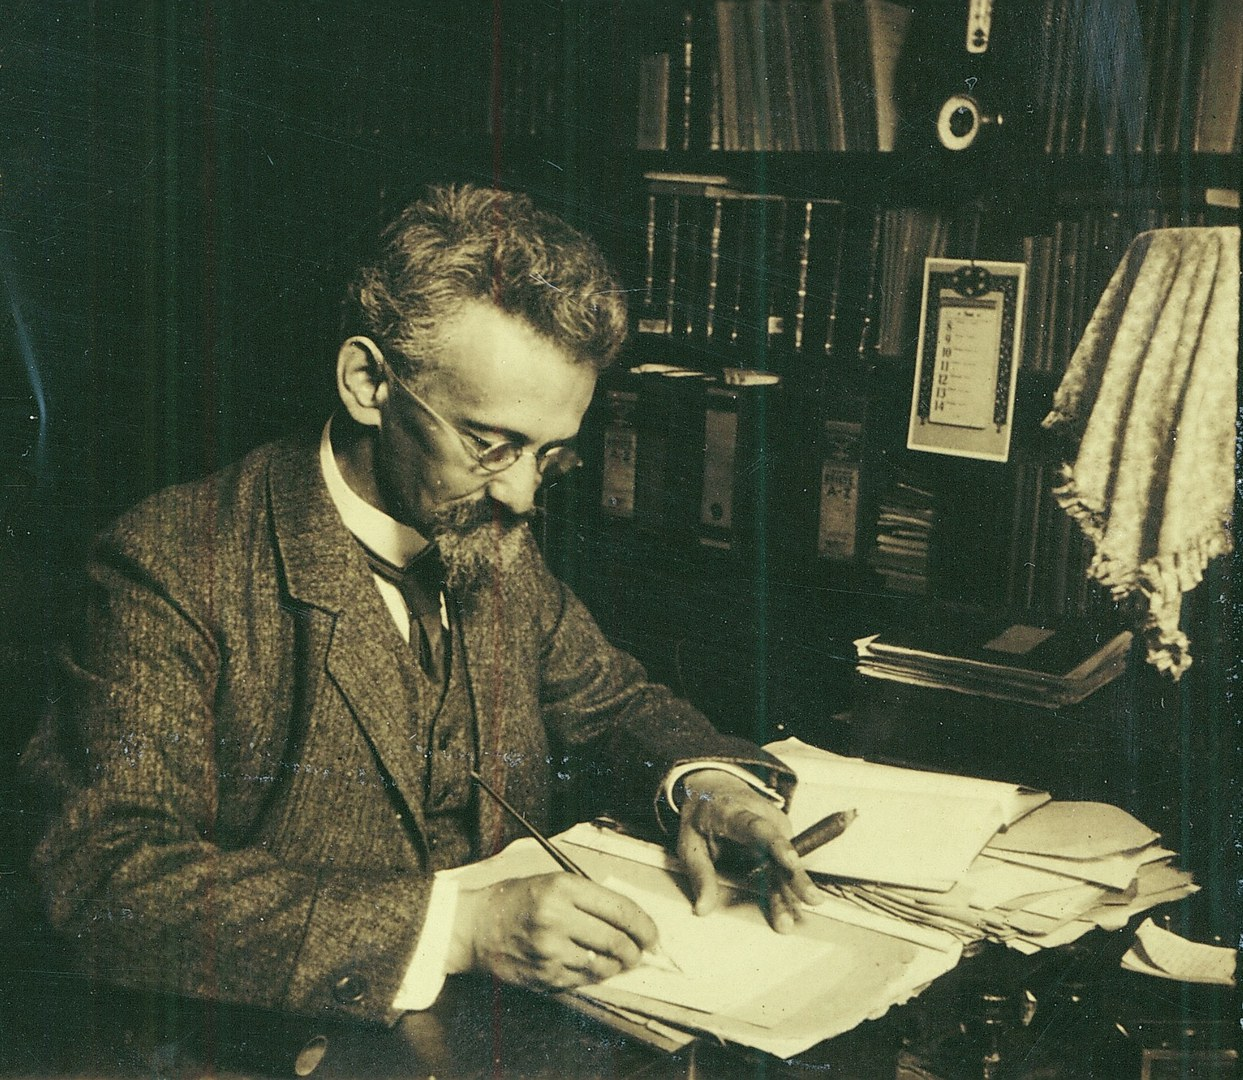 Professor Felix Hausdorff